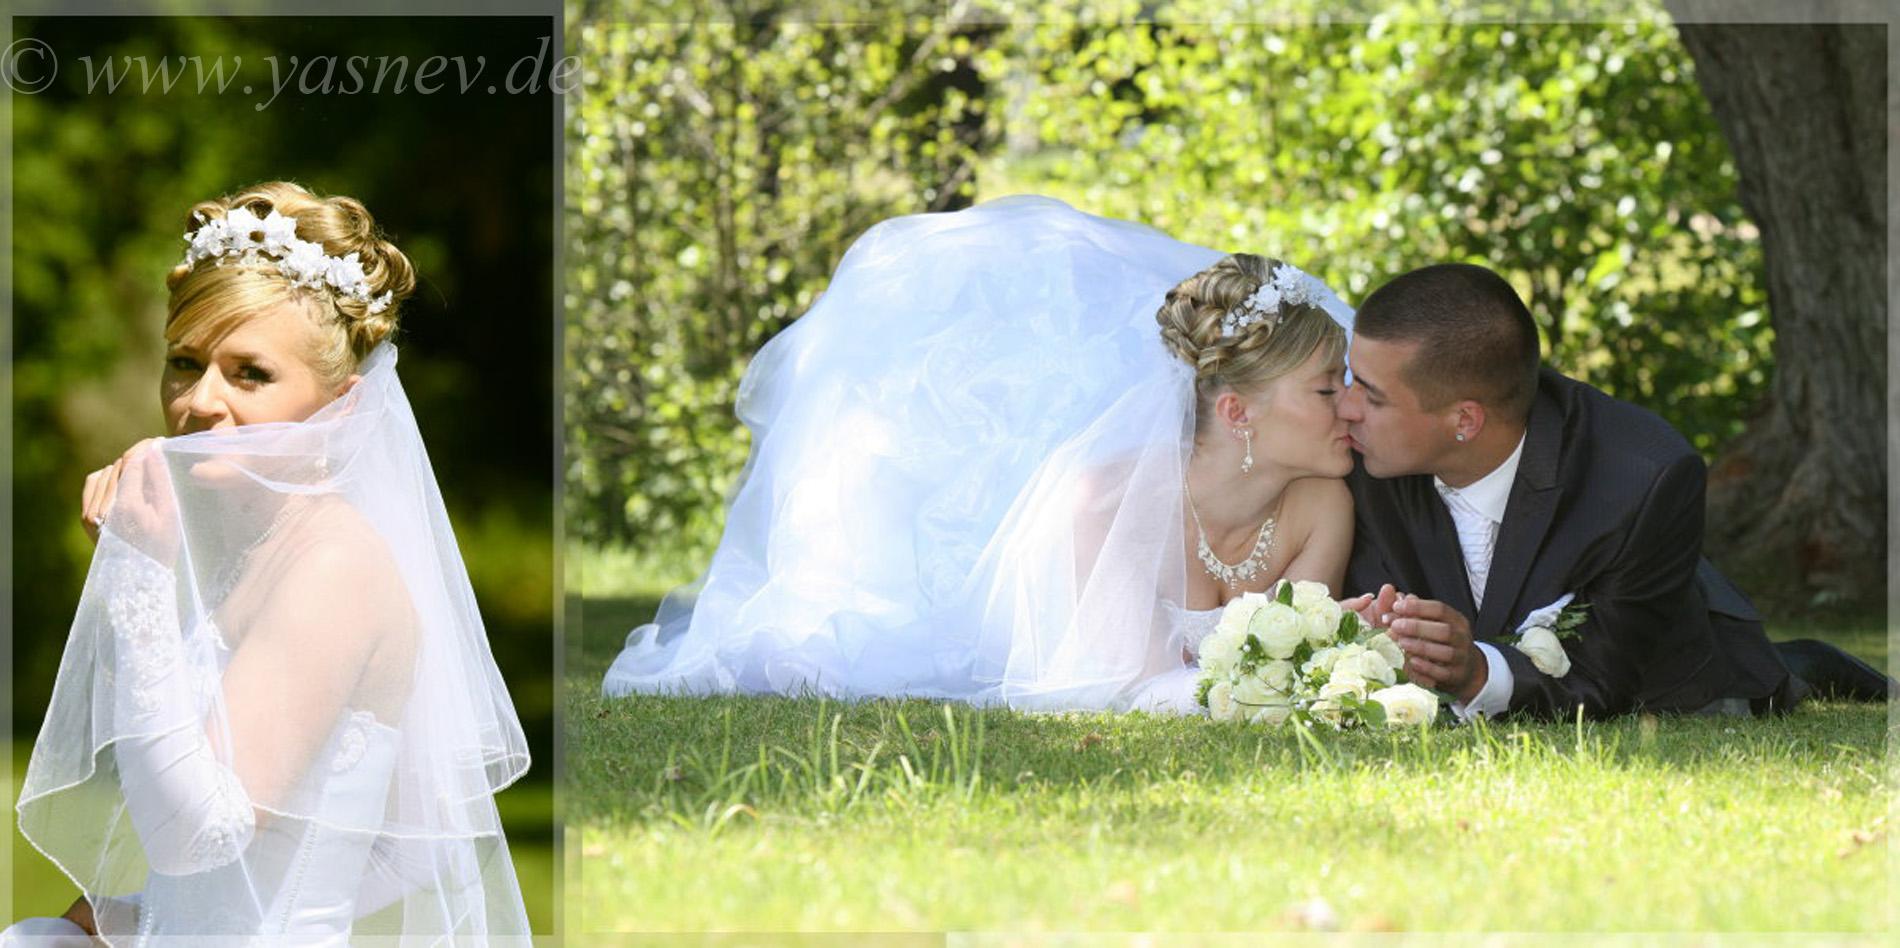 знакомства свадьба русский